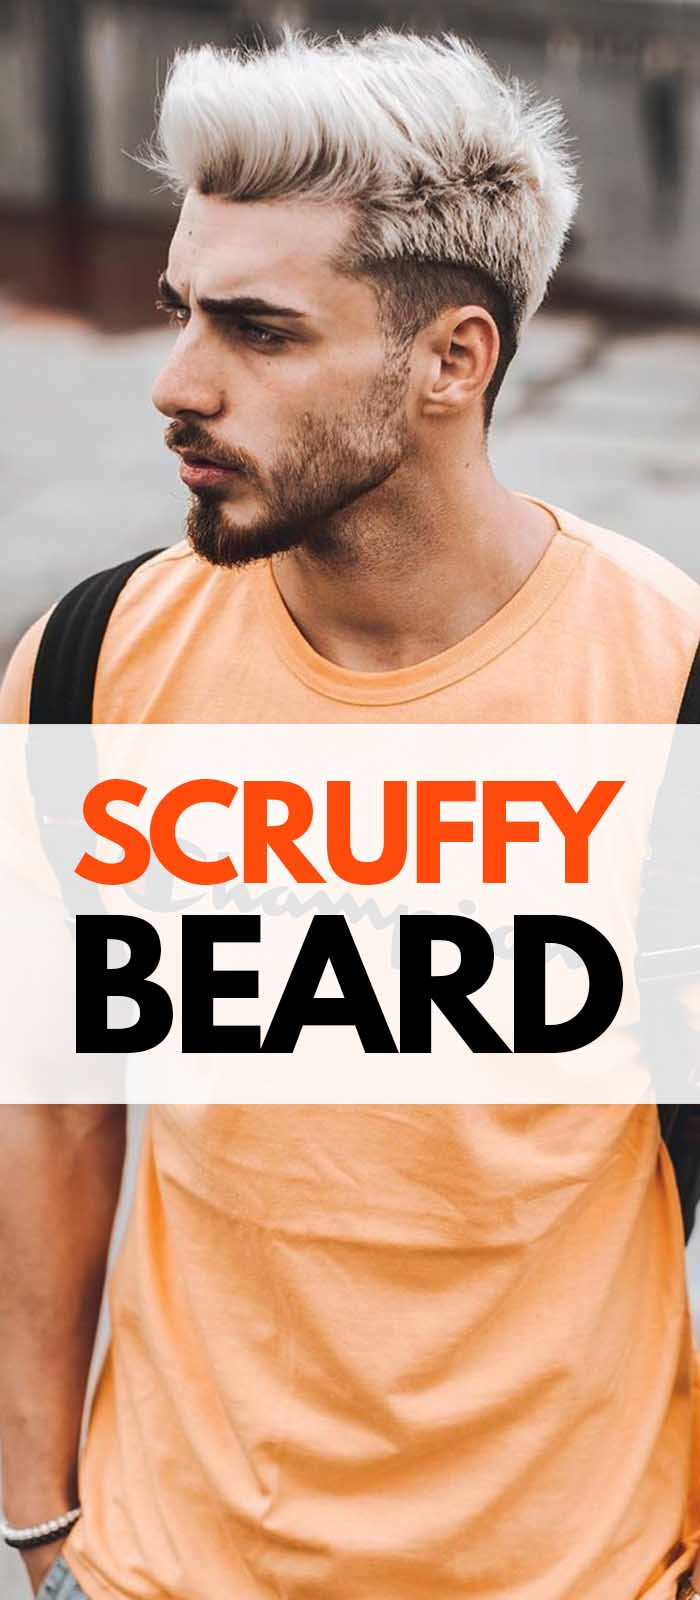 Scruffy Beard.